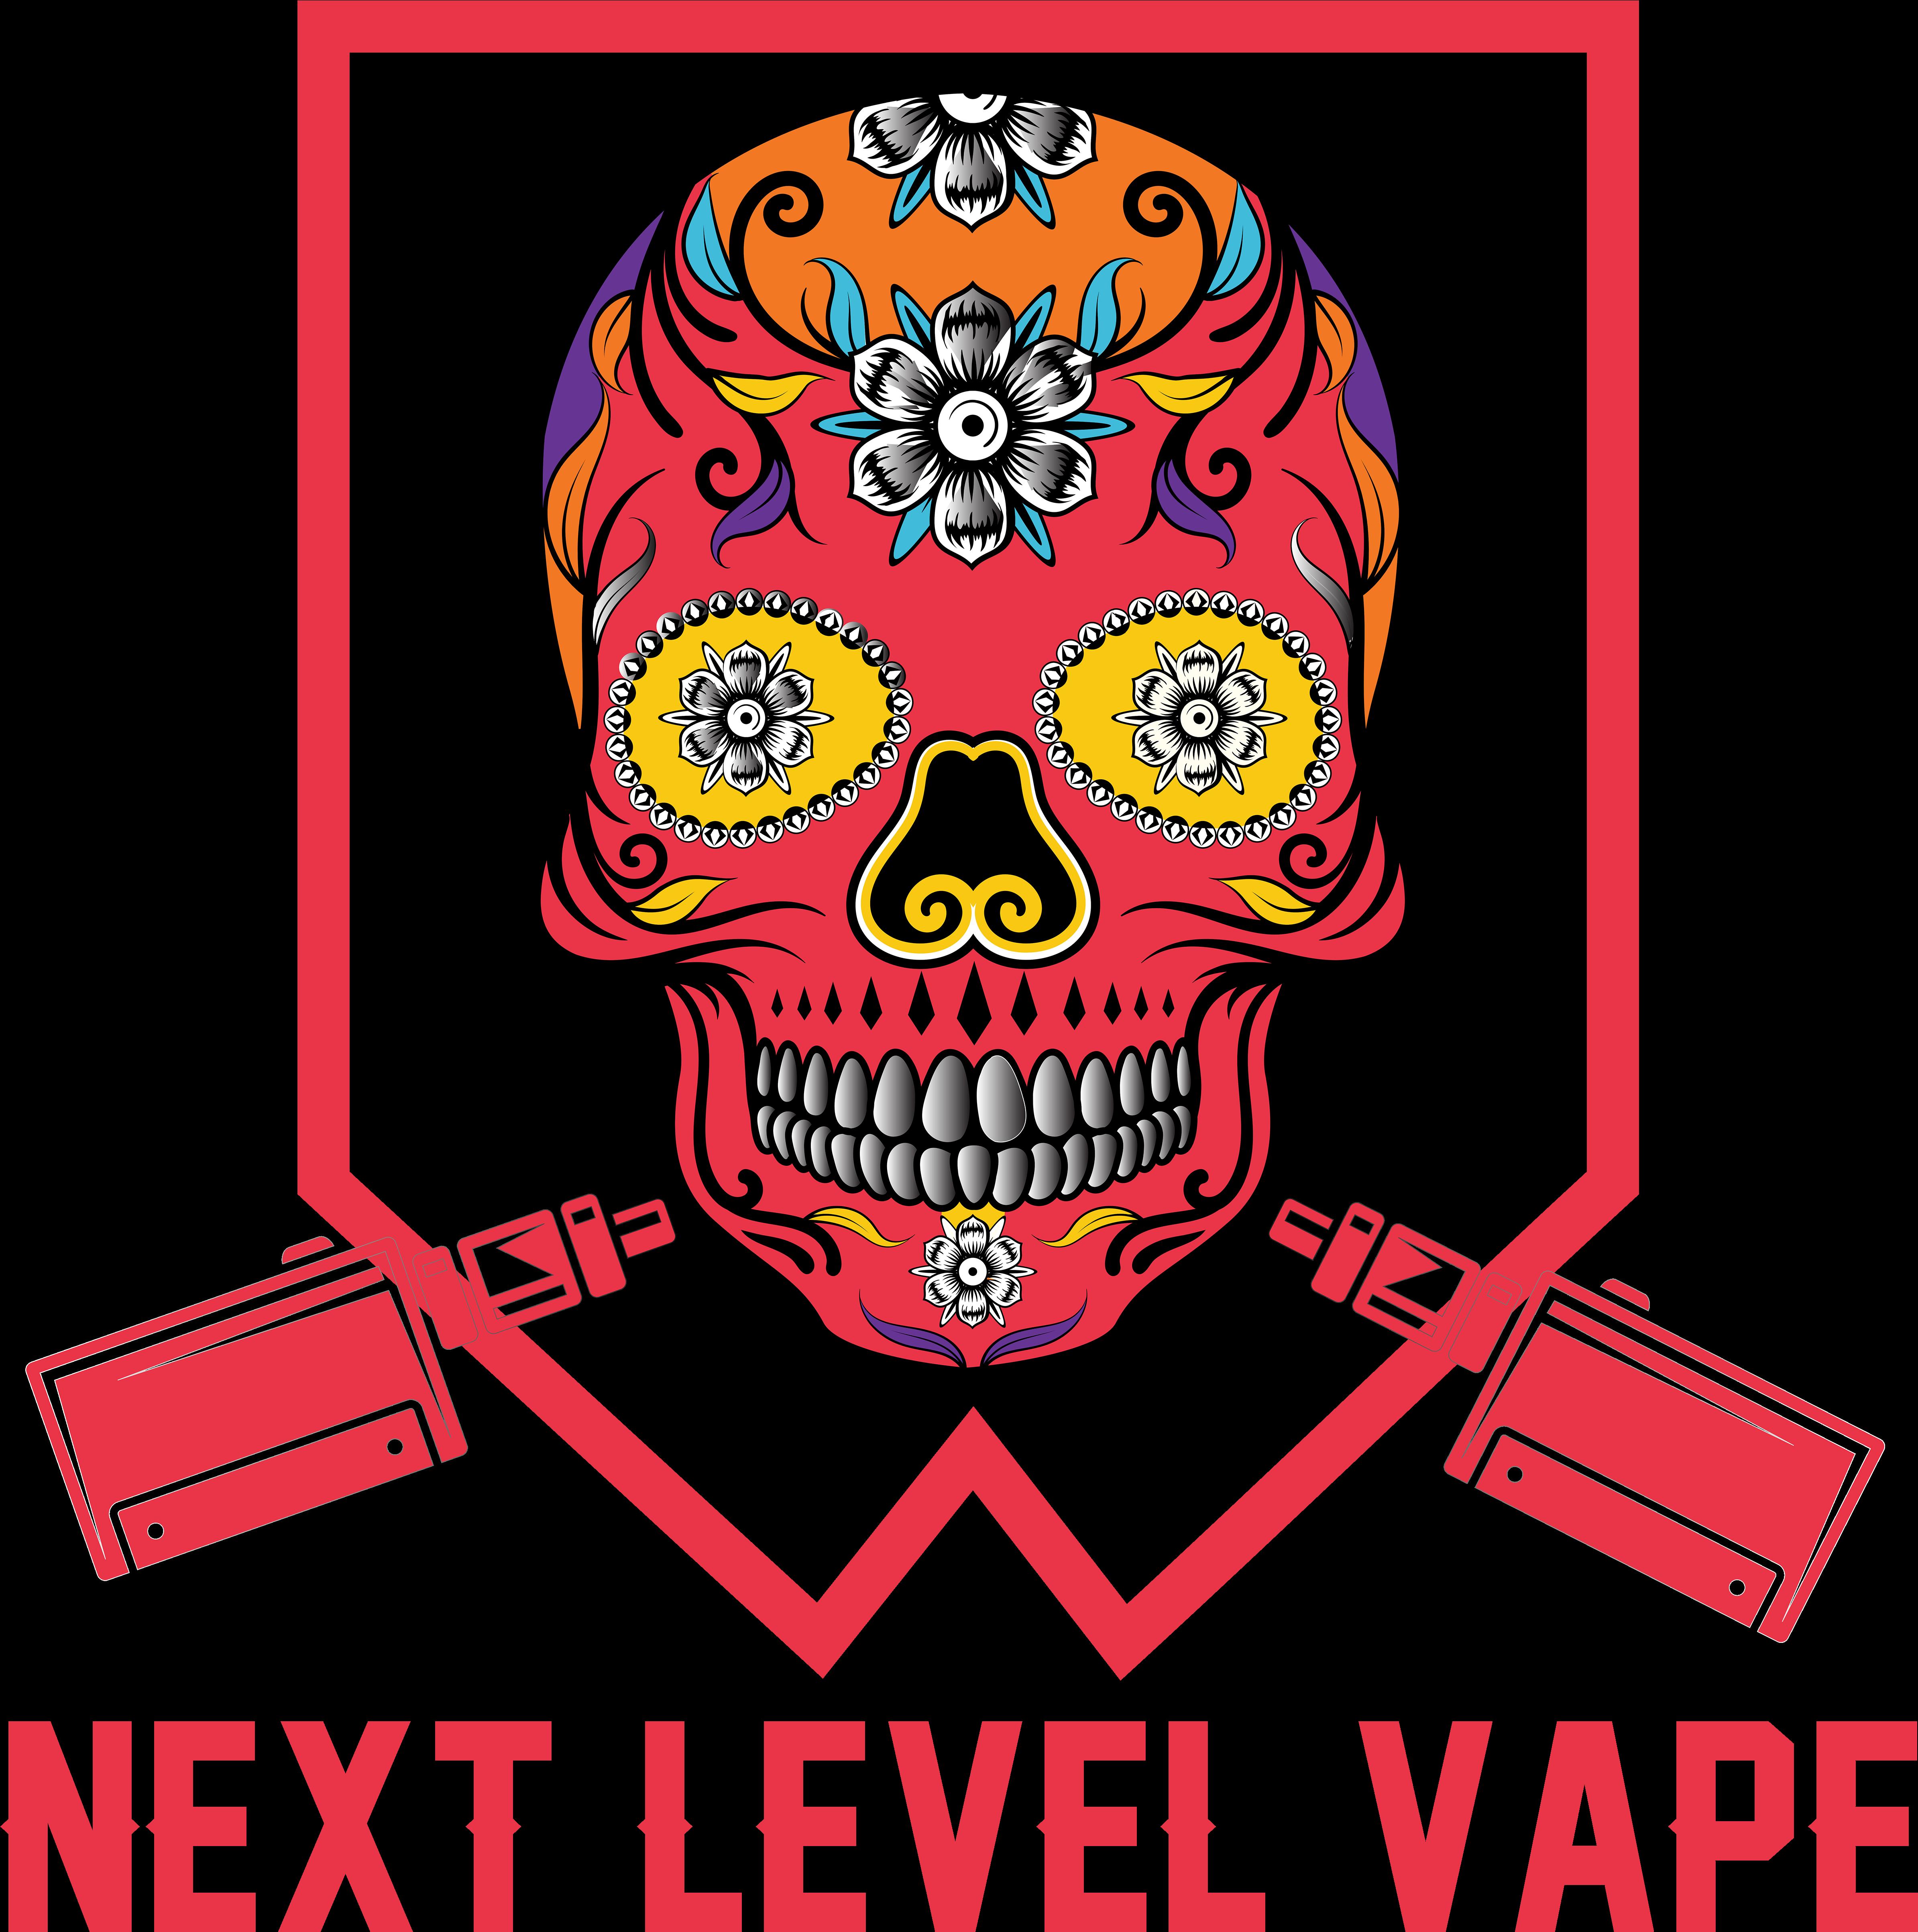 Next Level Vape.